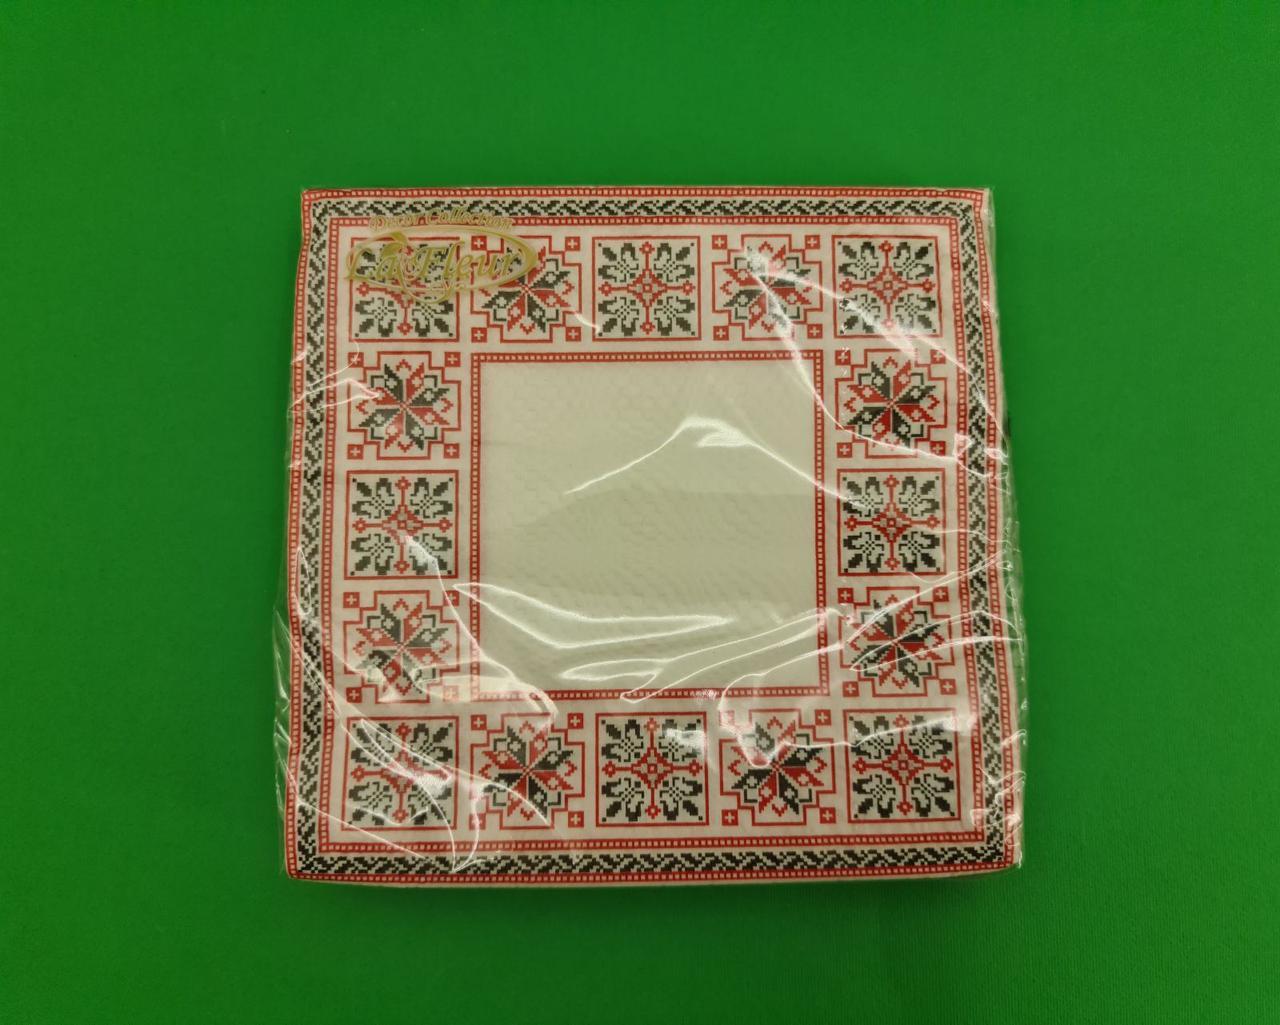 Салфетка декор (ЗЗхЗЗ, 20шт)  La Fleur Симметричный орнамент (1 пач)